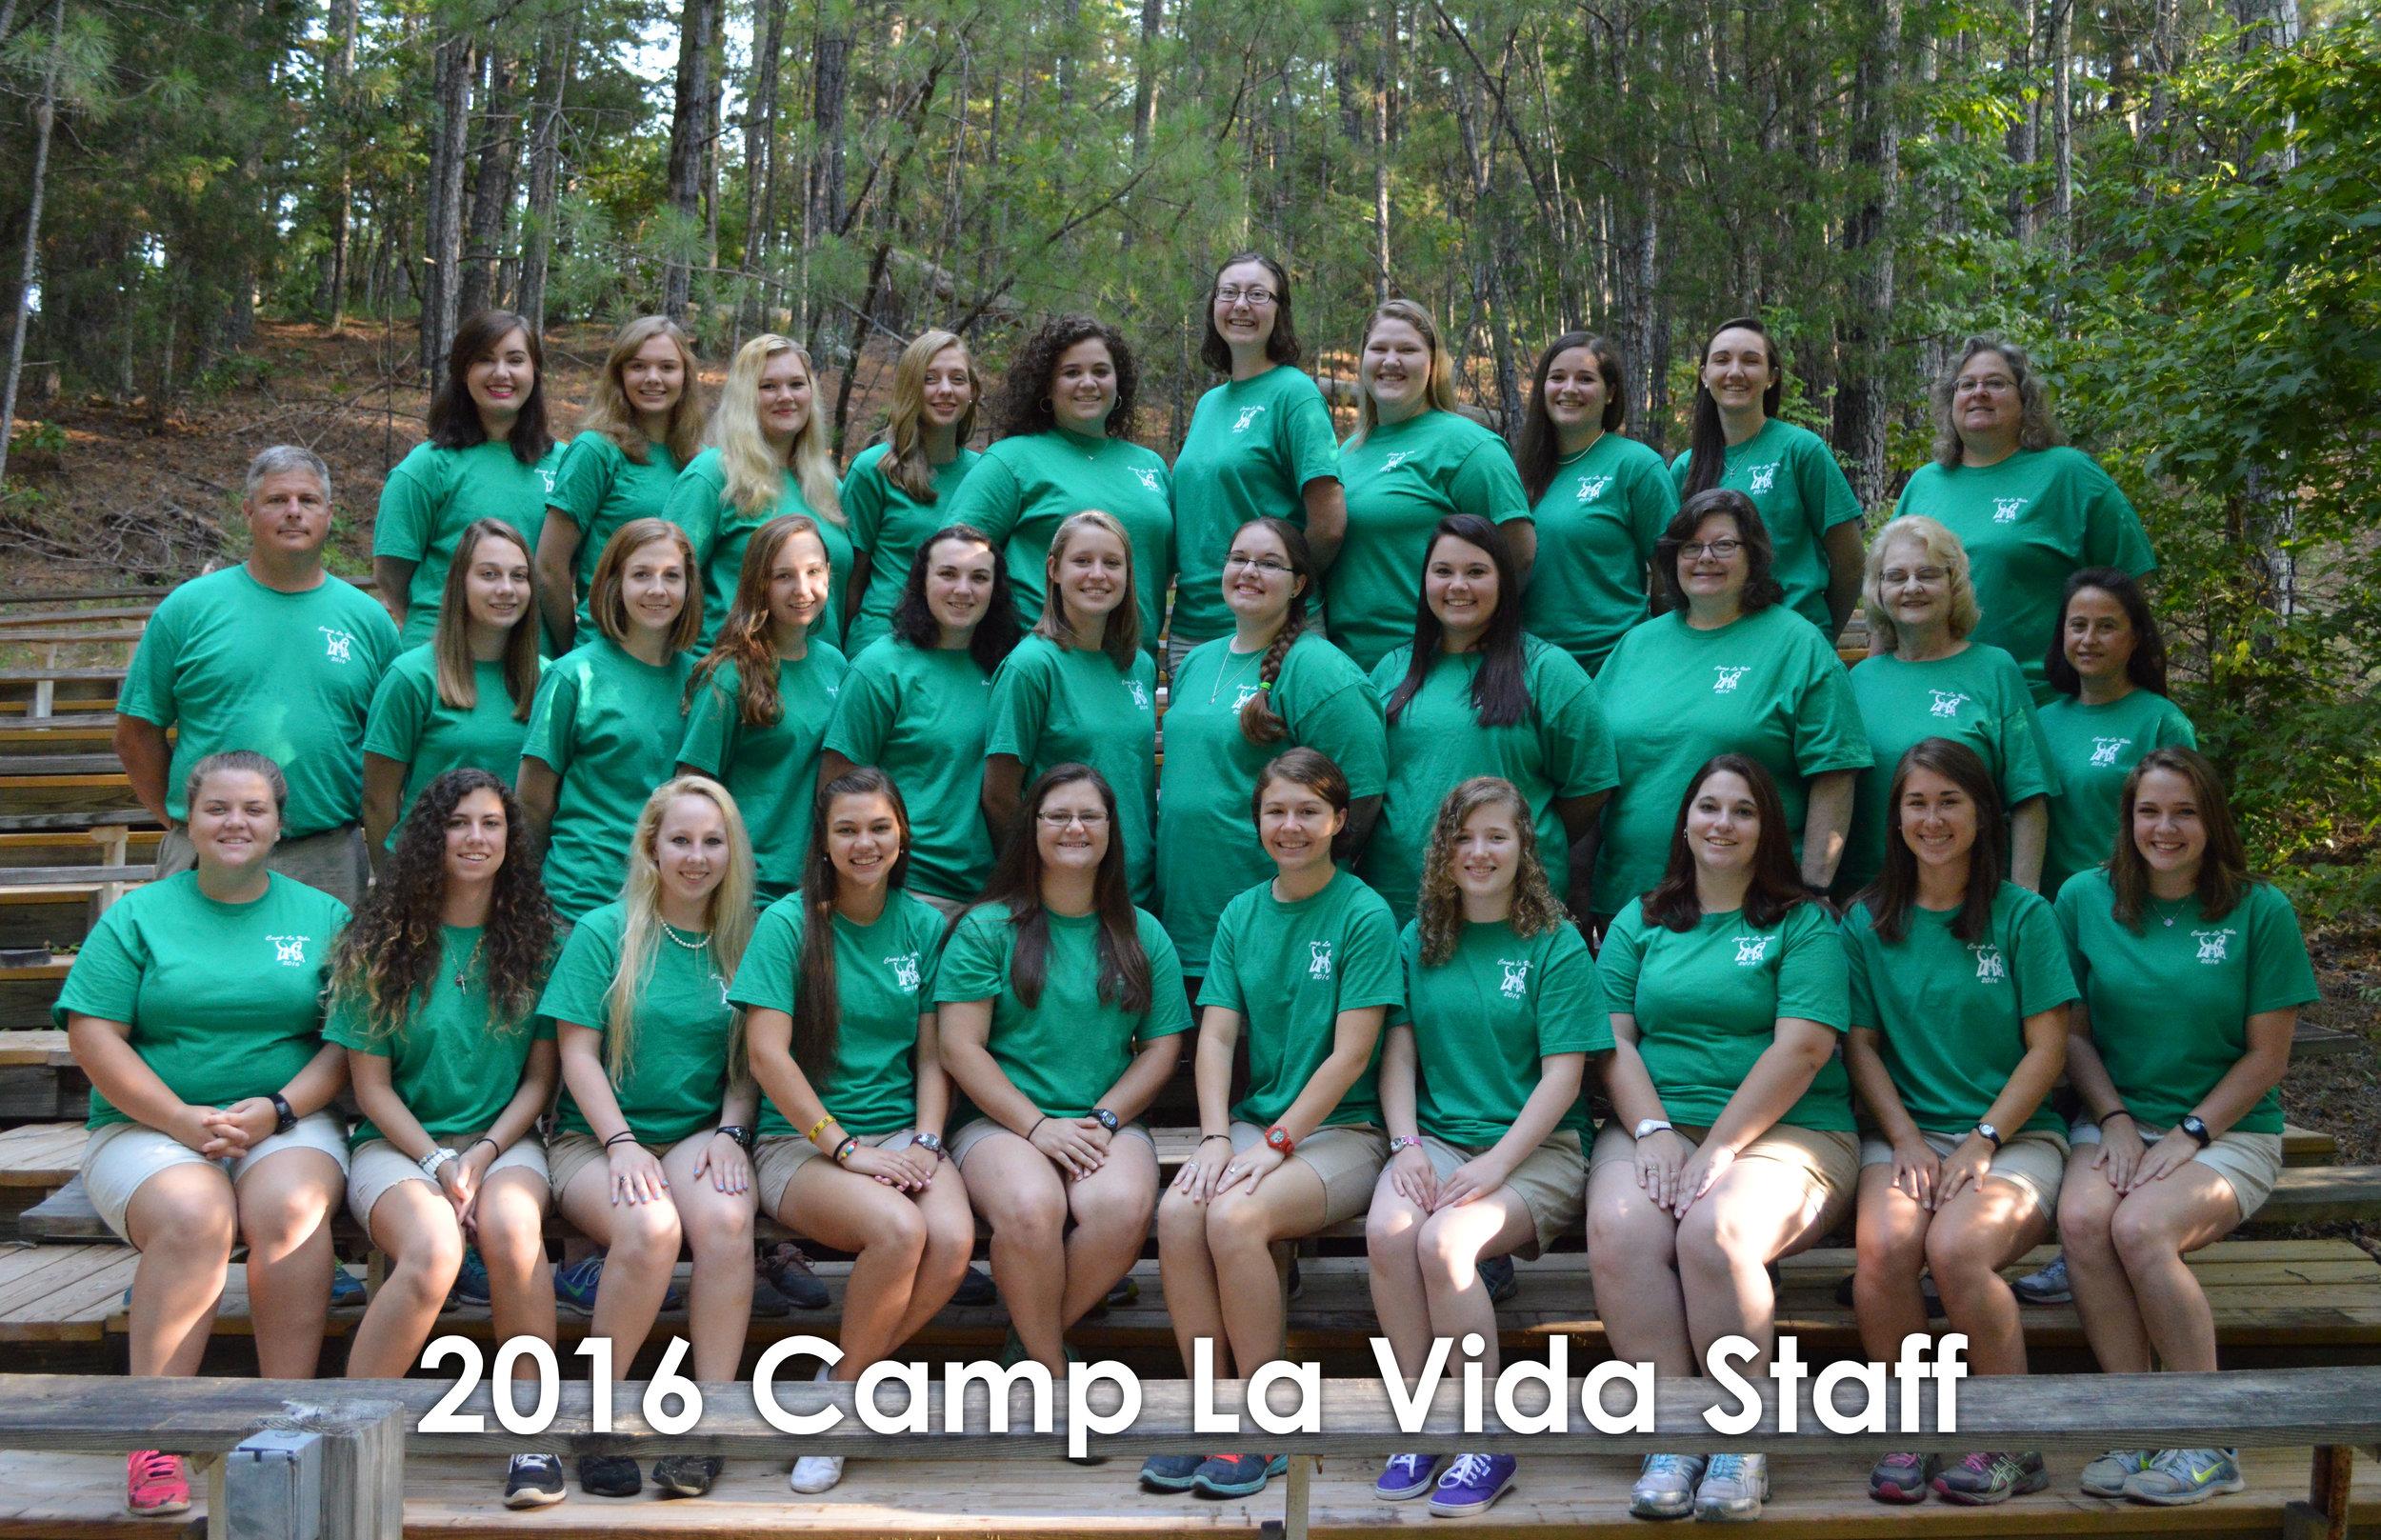 CLV staff 2016 .jpg